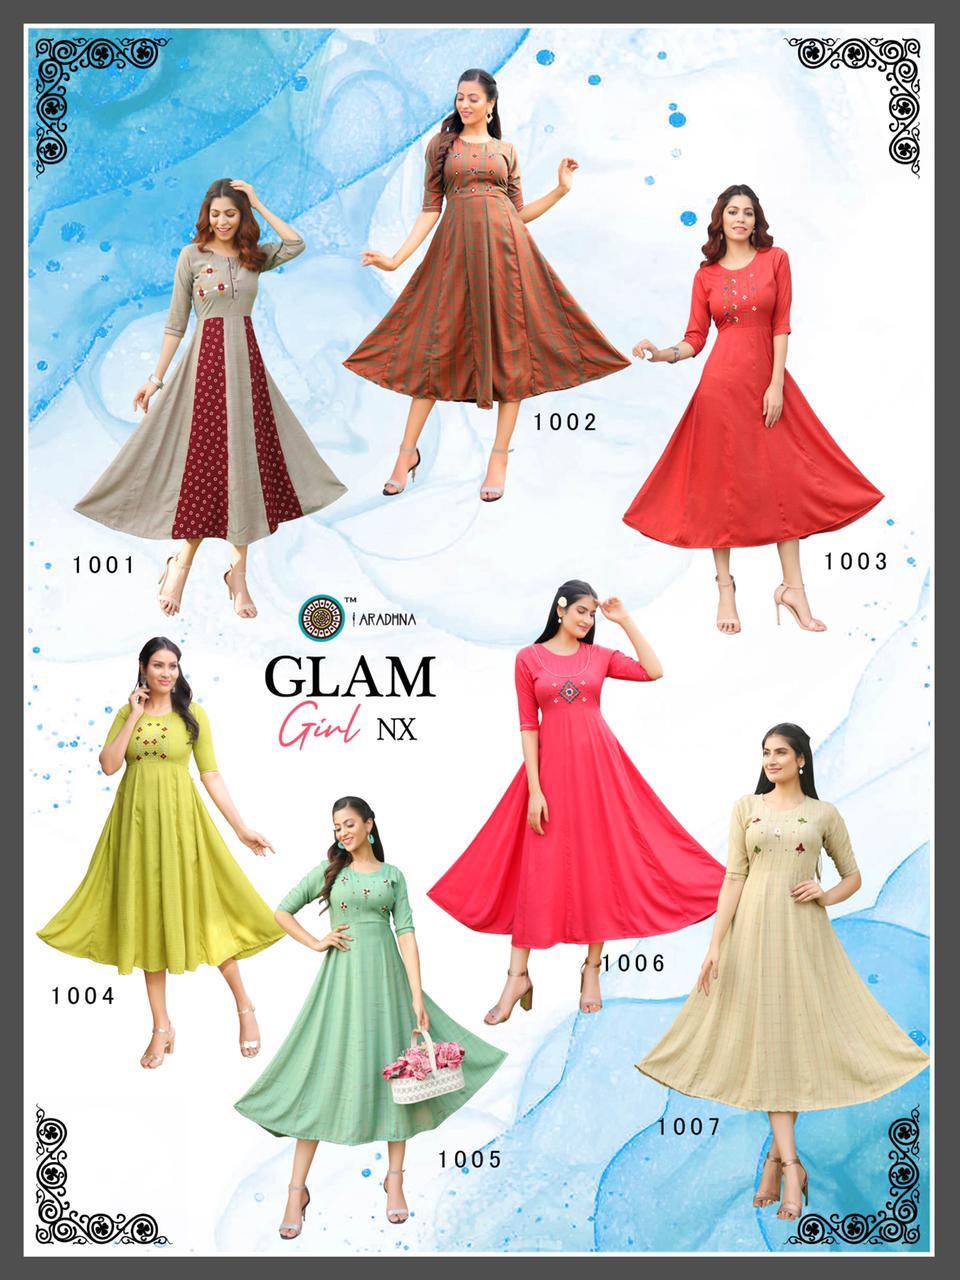 Aradhna Glam Girl Nx Kurti Wholesale Catalog 7 Pcs 13 - Aradhna Glam Girl Nx Kurti Wholesale Catalog 7 Pcs